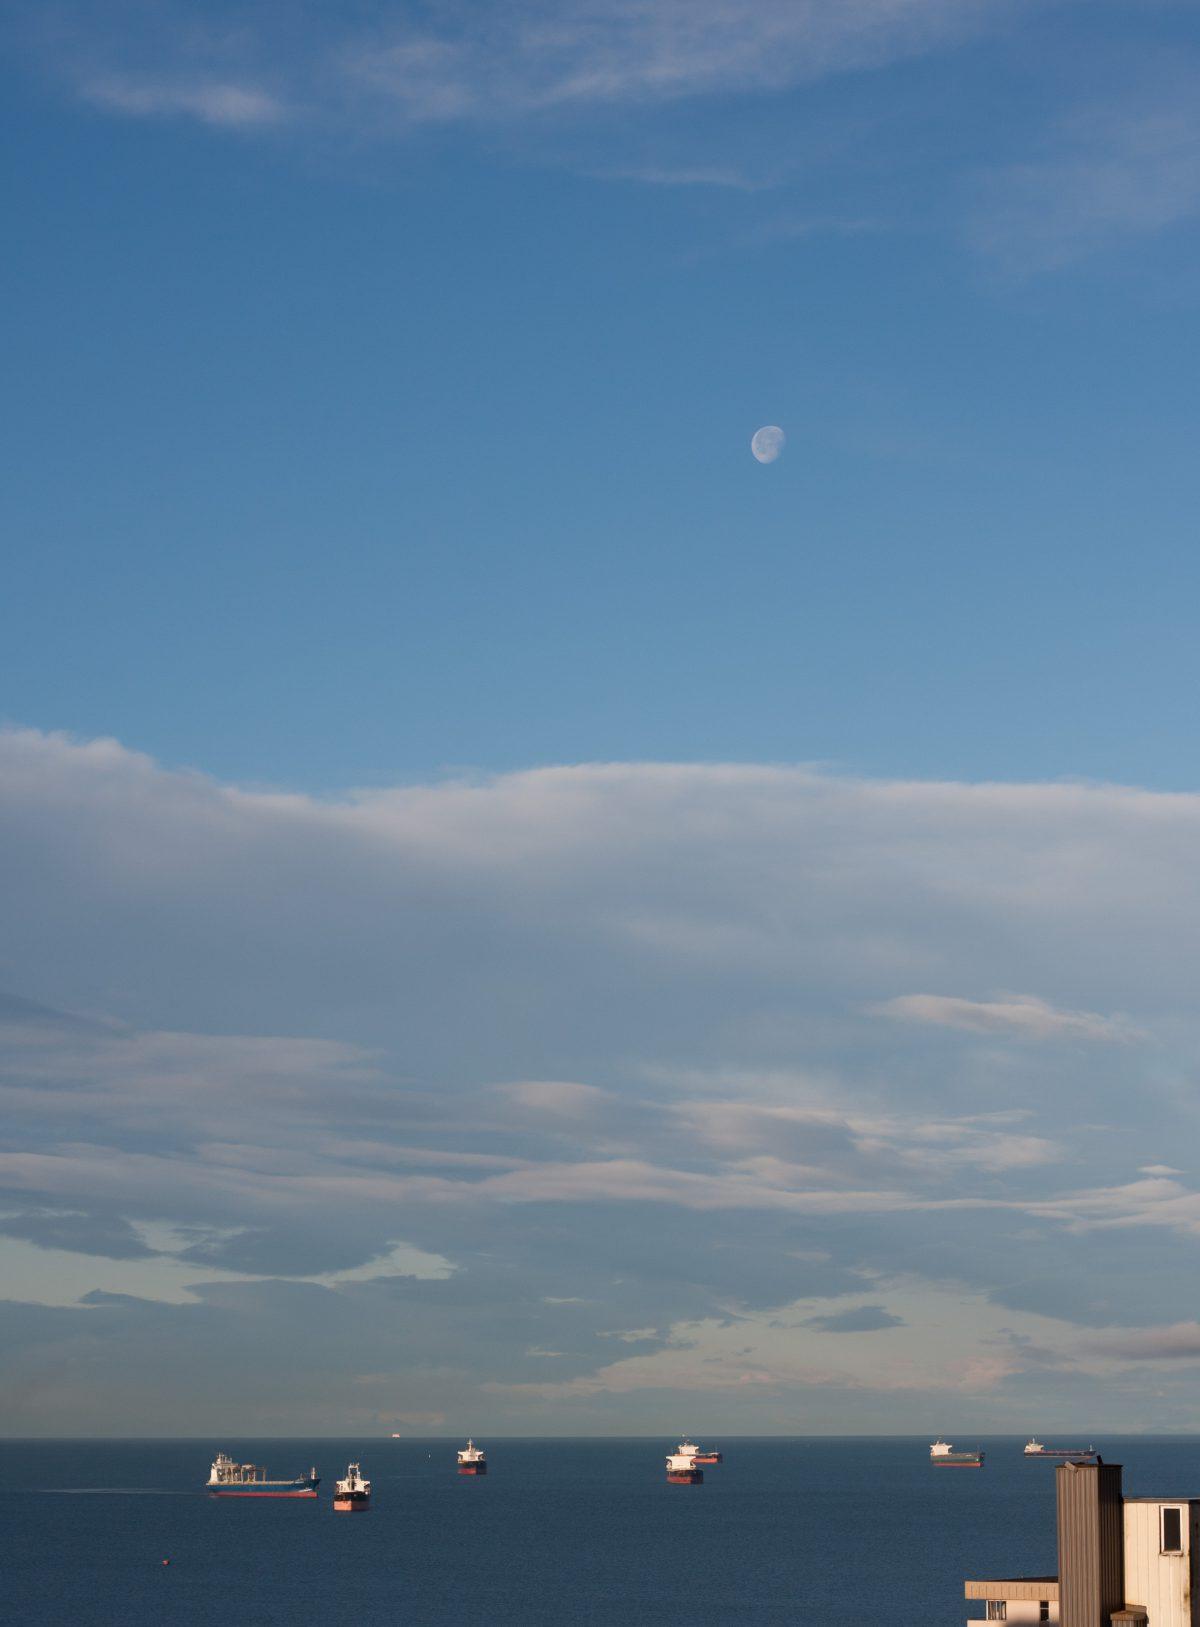 sea, boat, sky, cloud